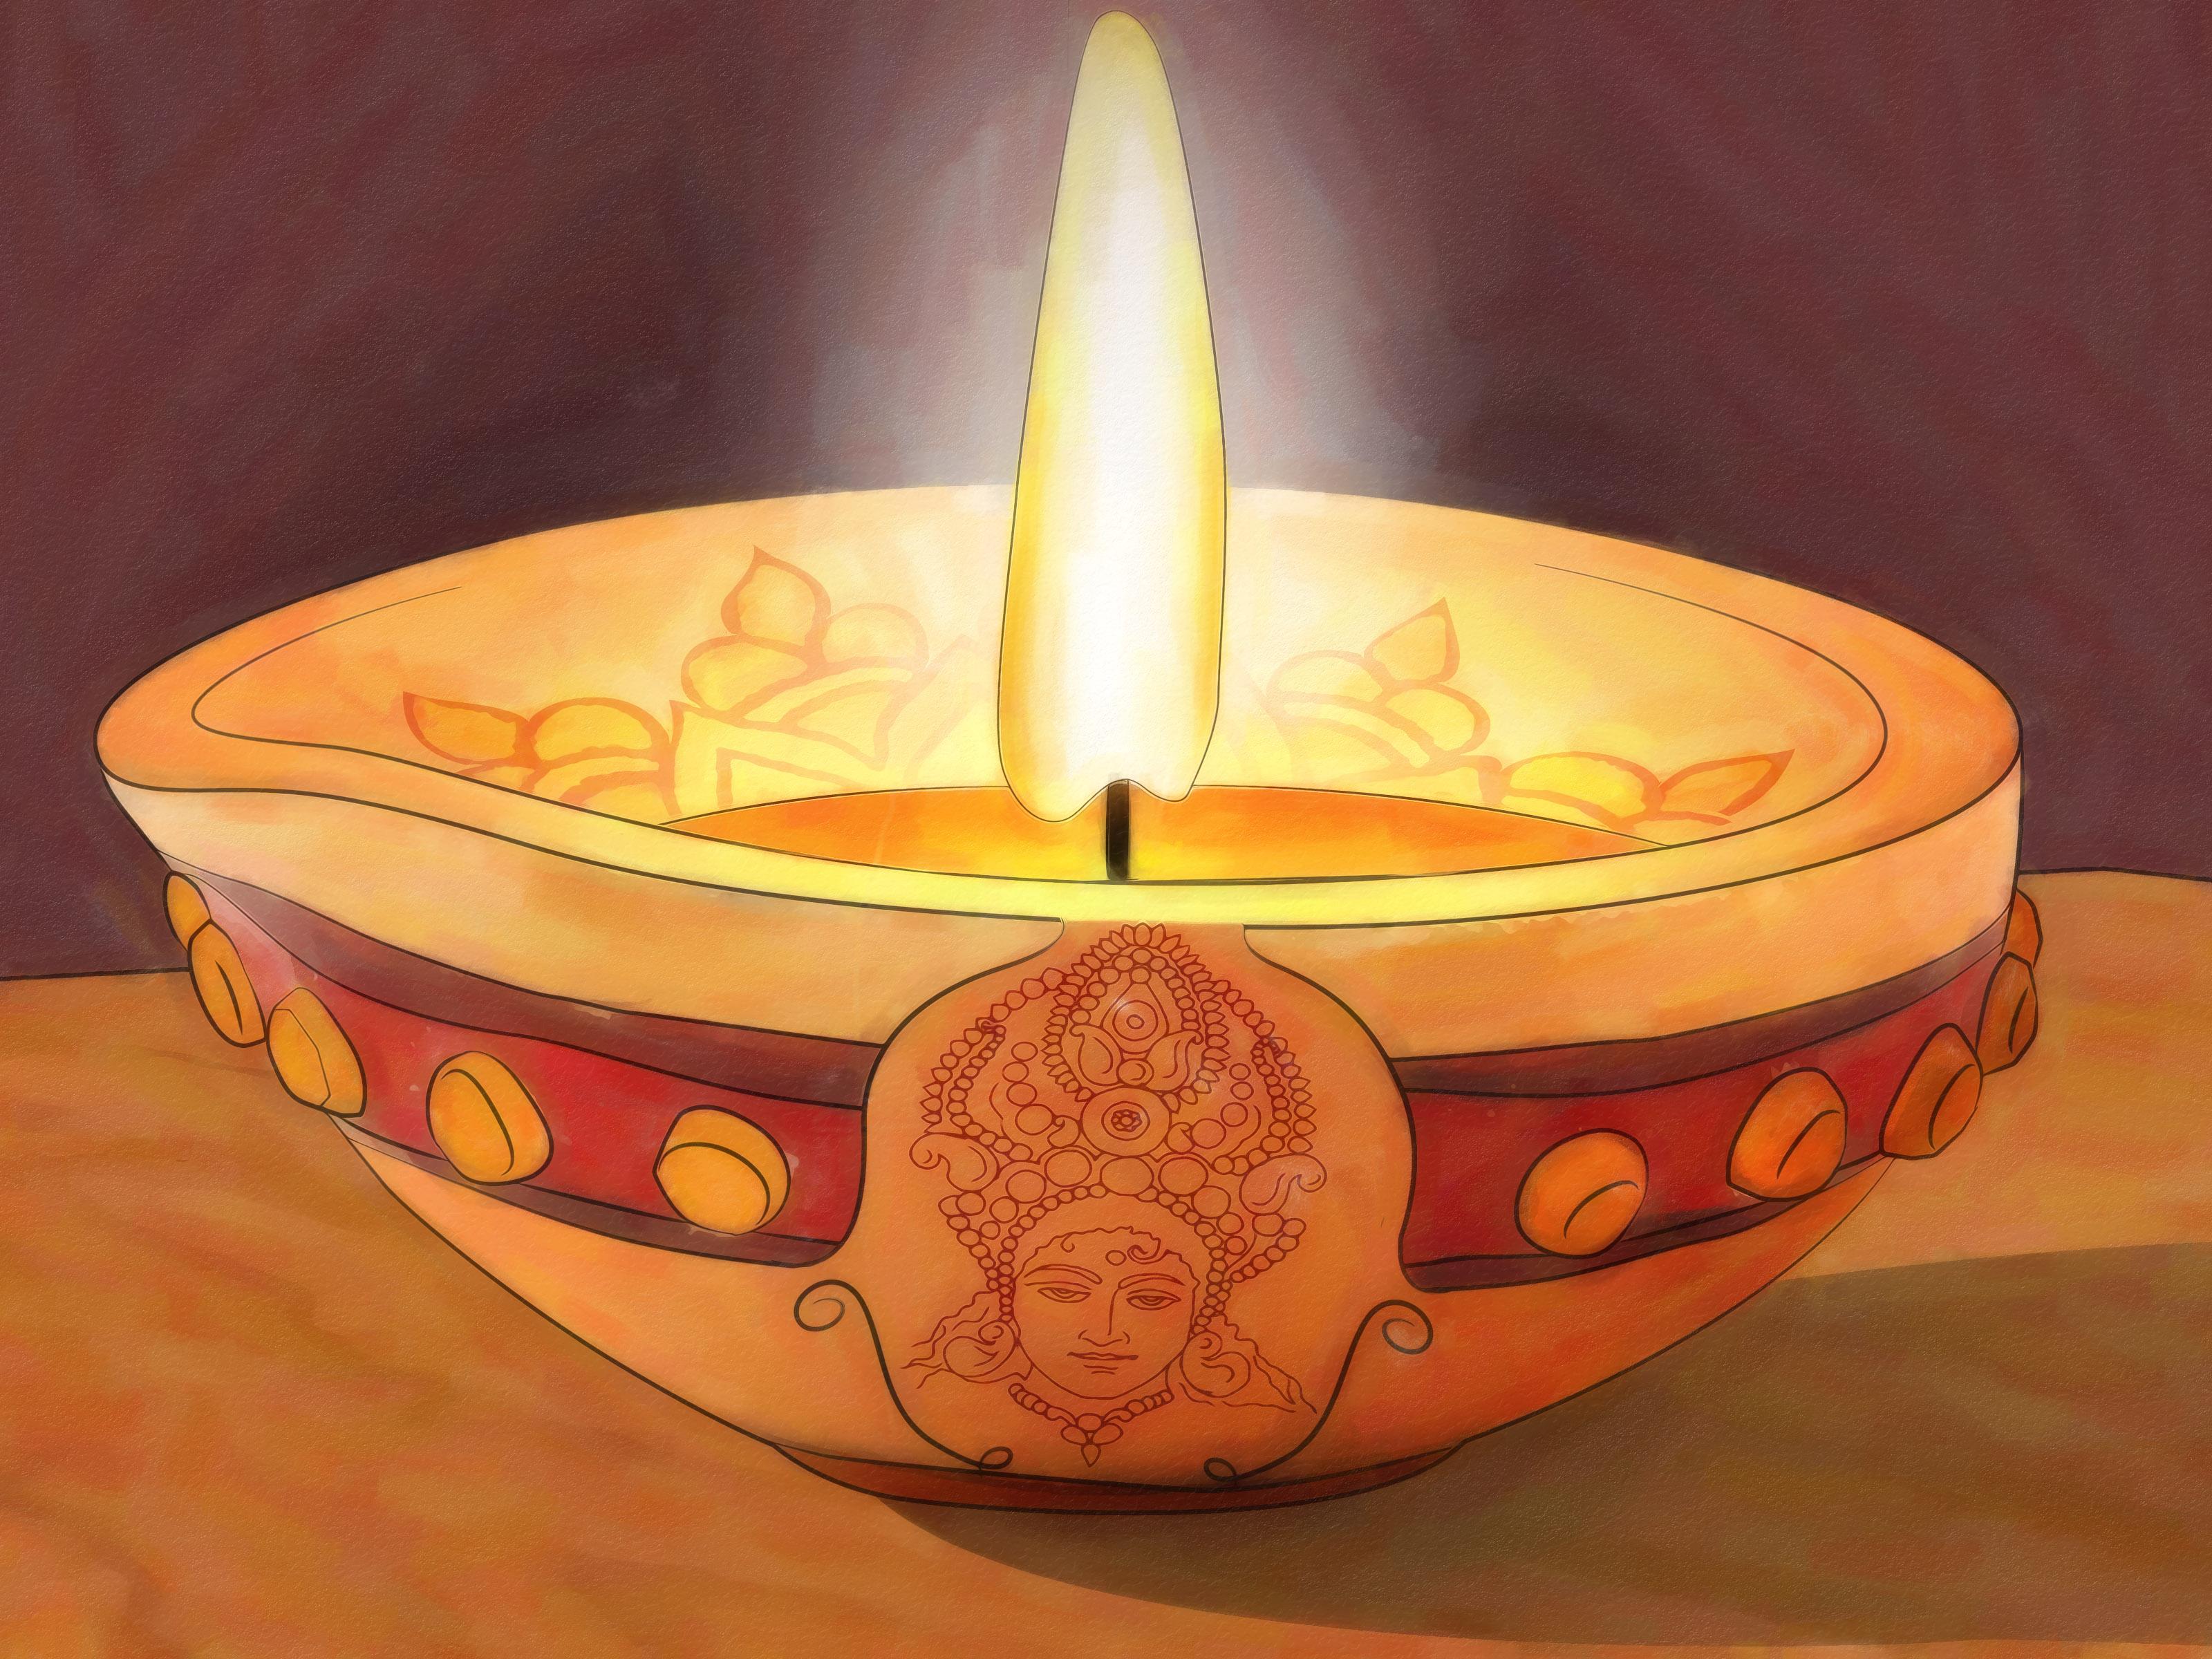 3 Ways to Decorate a Diya  wikiHow